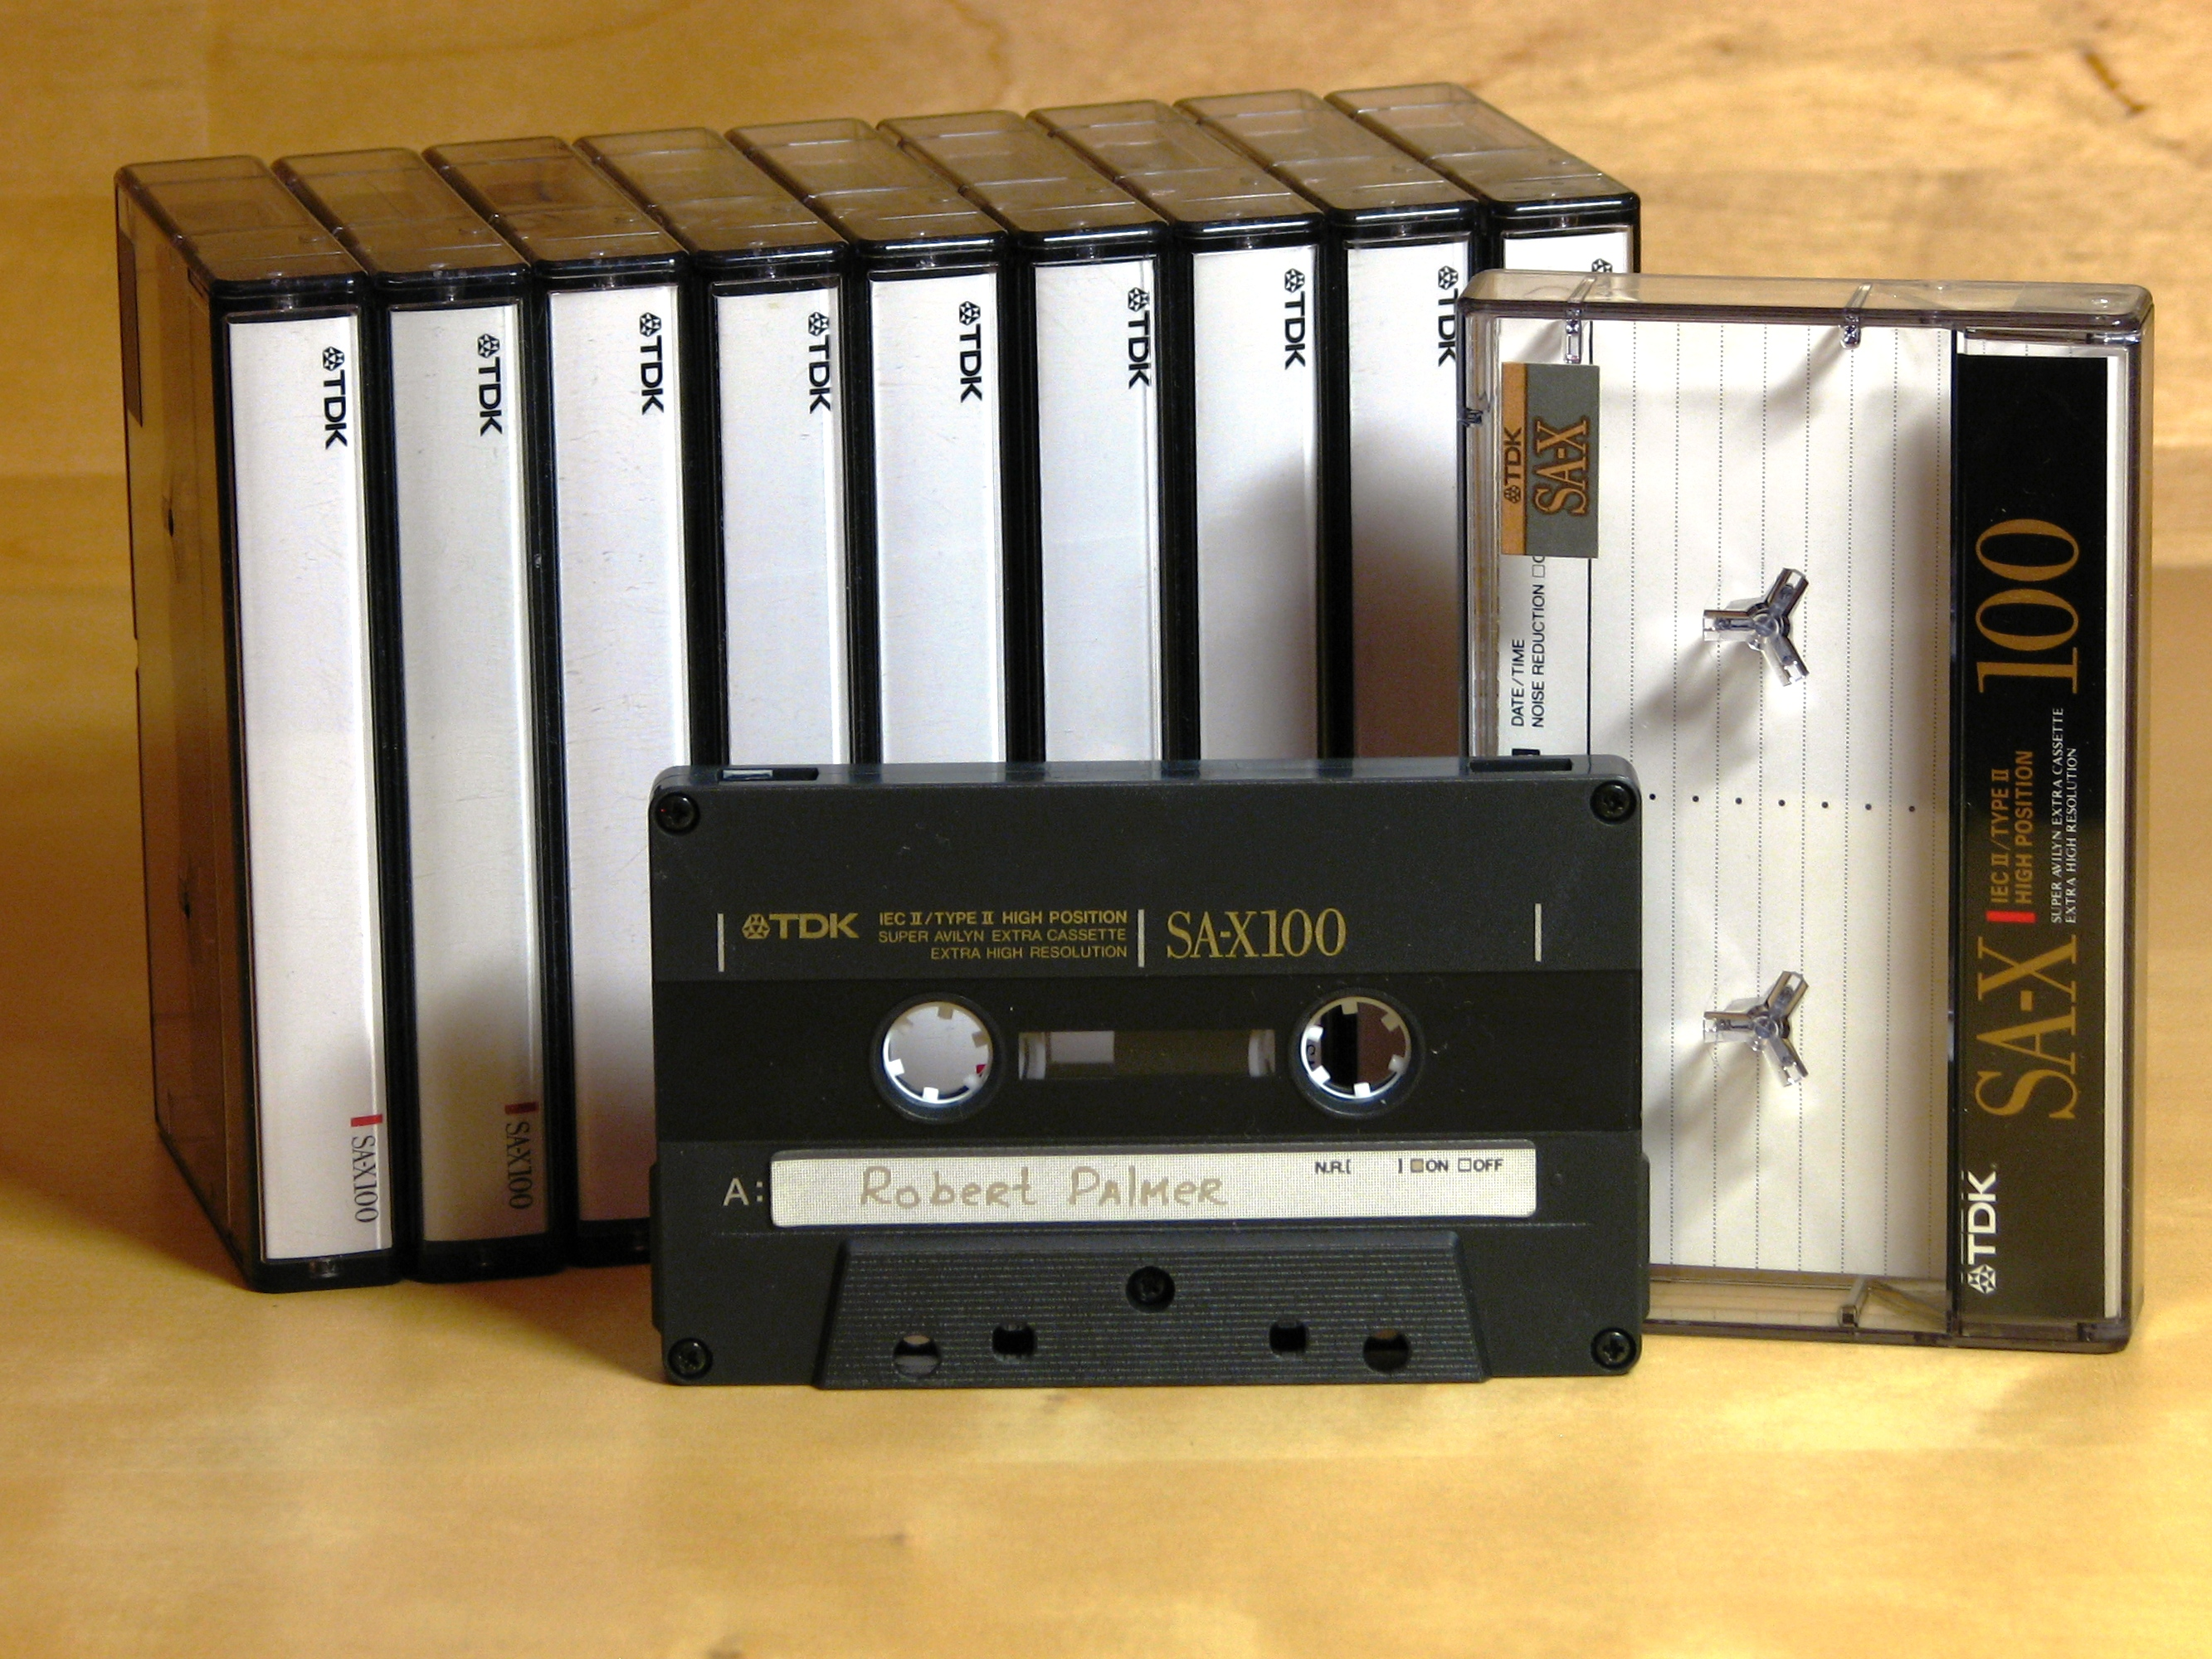 100 Minute Clock Chart: Compact Cassette - TDK SA-X 100.JPG - Wikimedia Commons,Chart